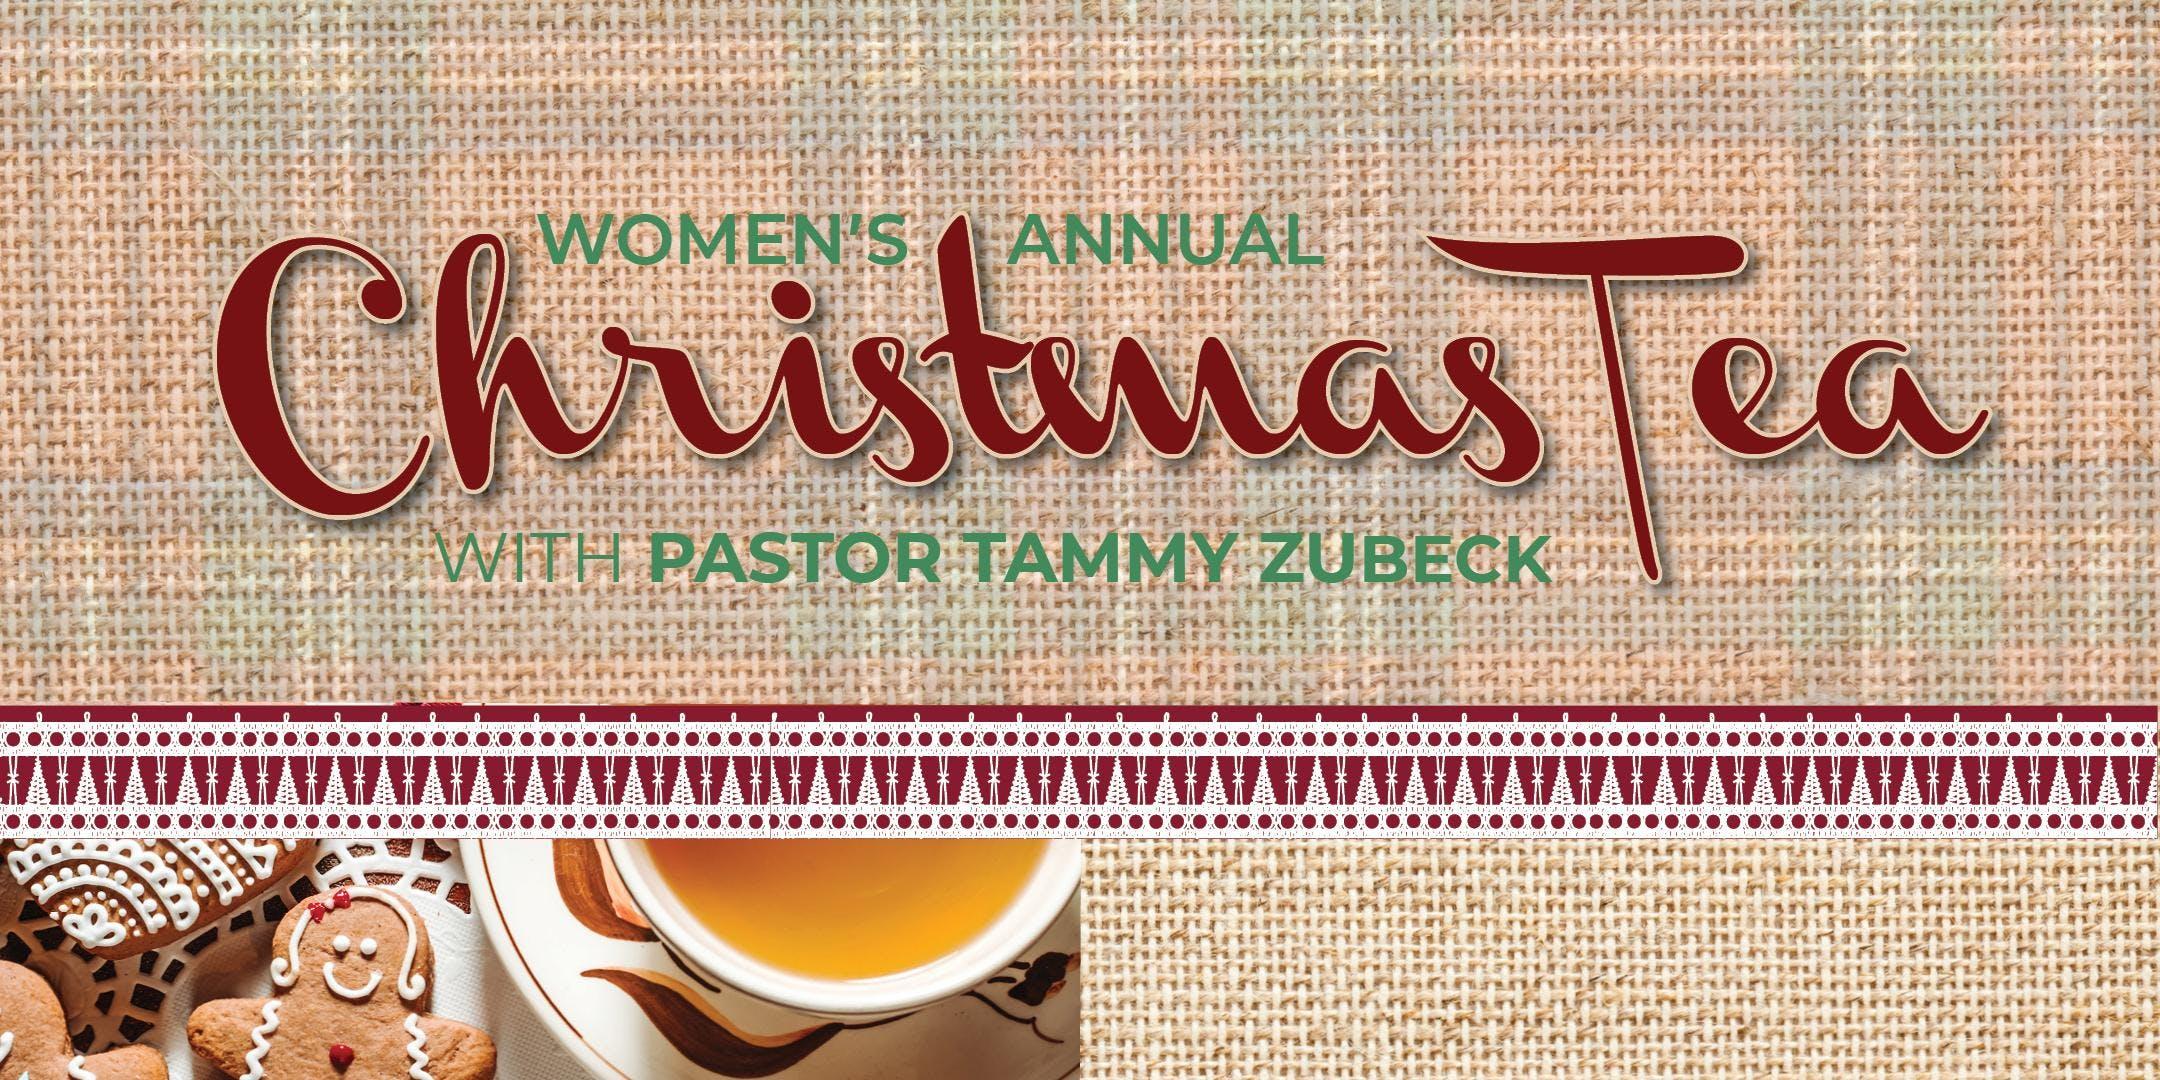 Annual Women's Christmas Tea Party